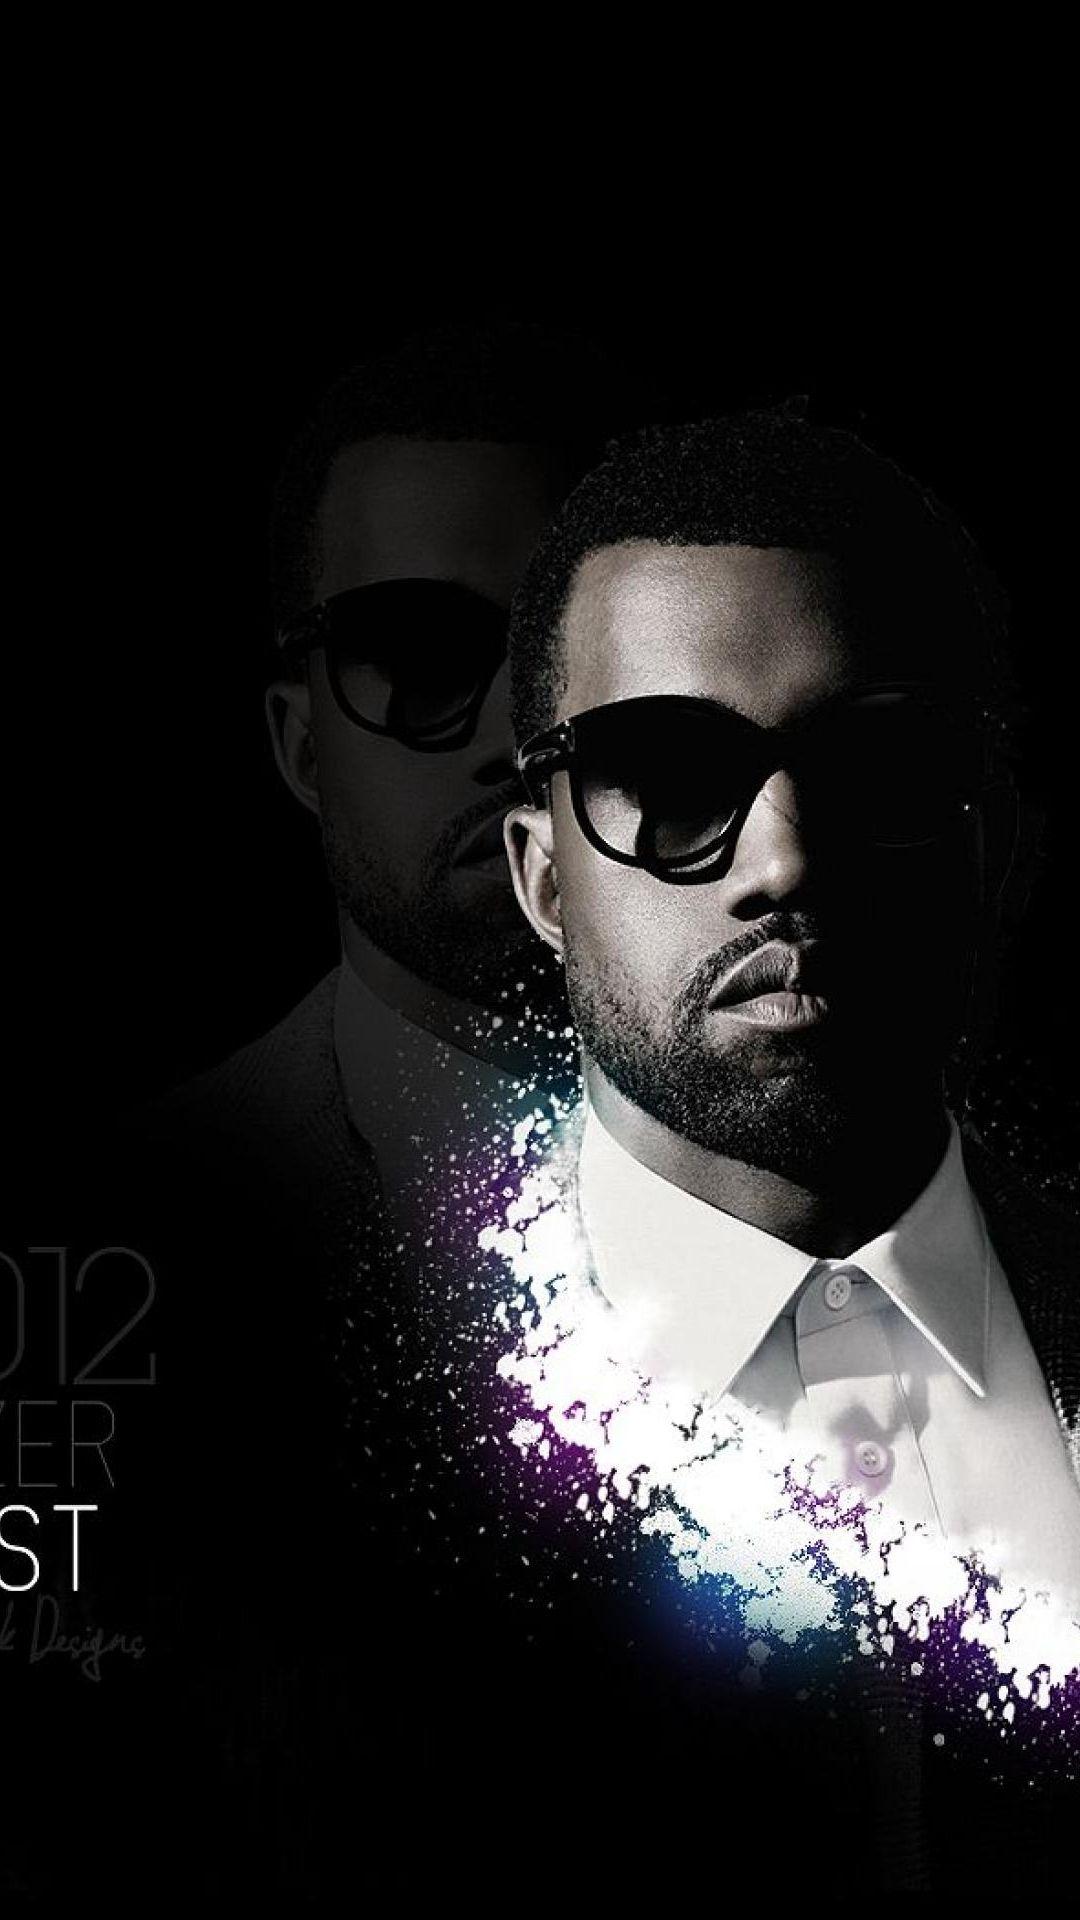 Kanye West HD wallpaper for mobile